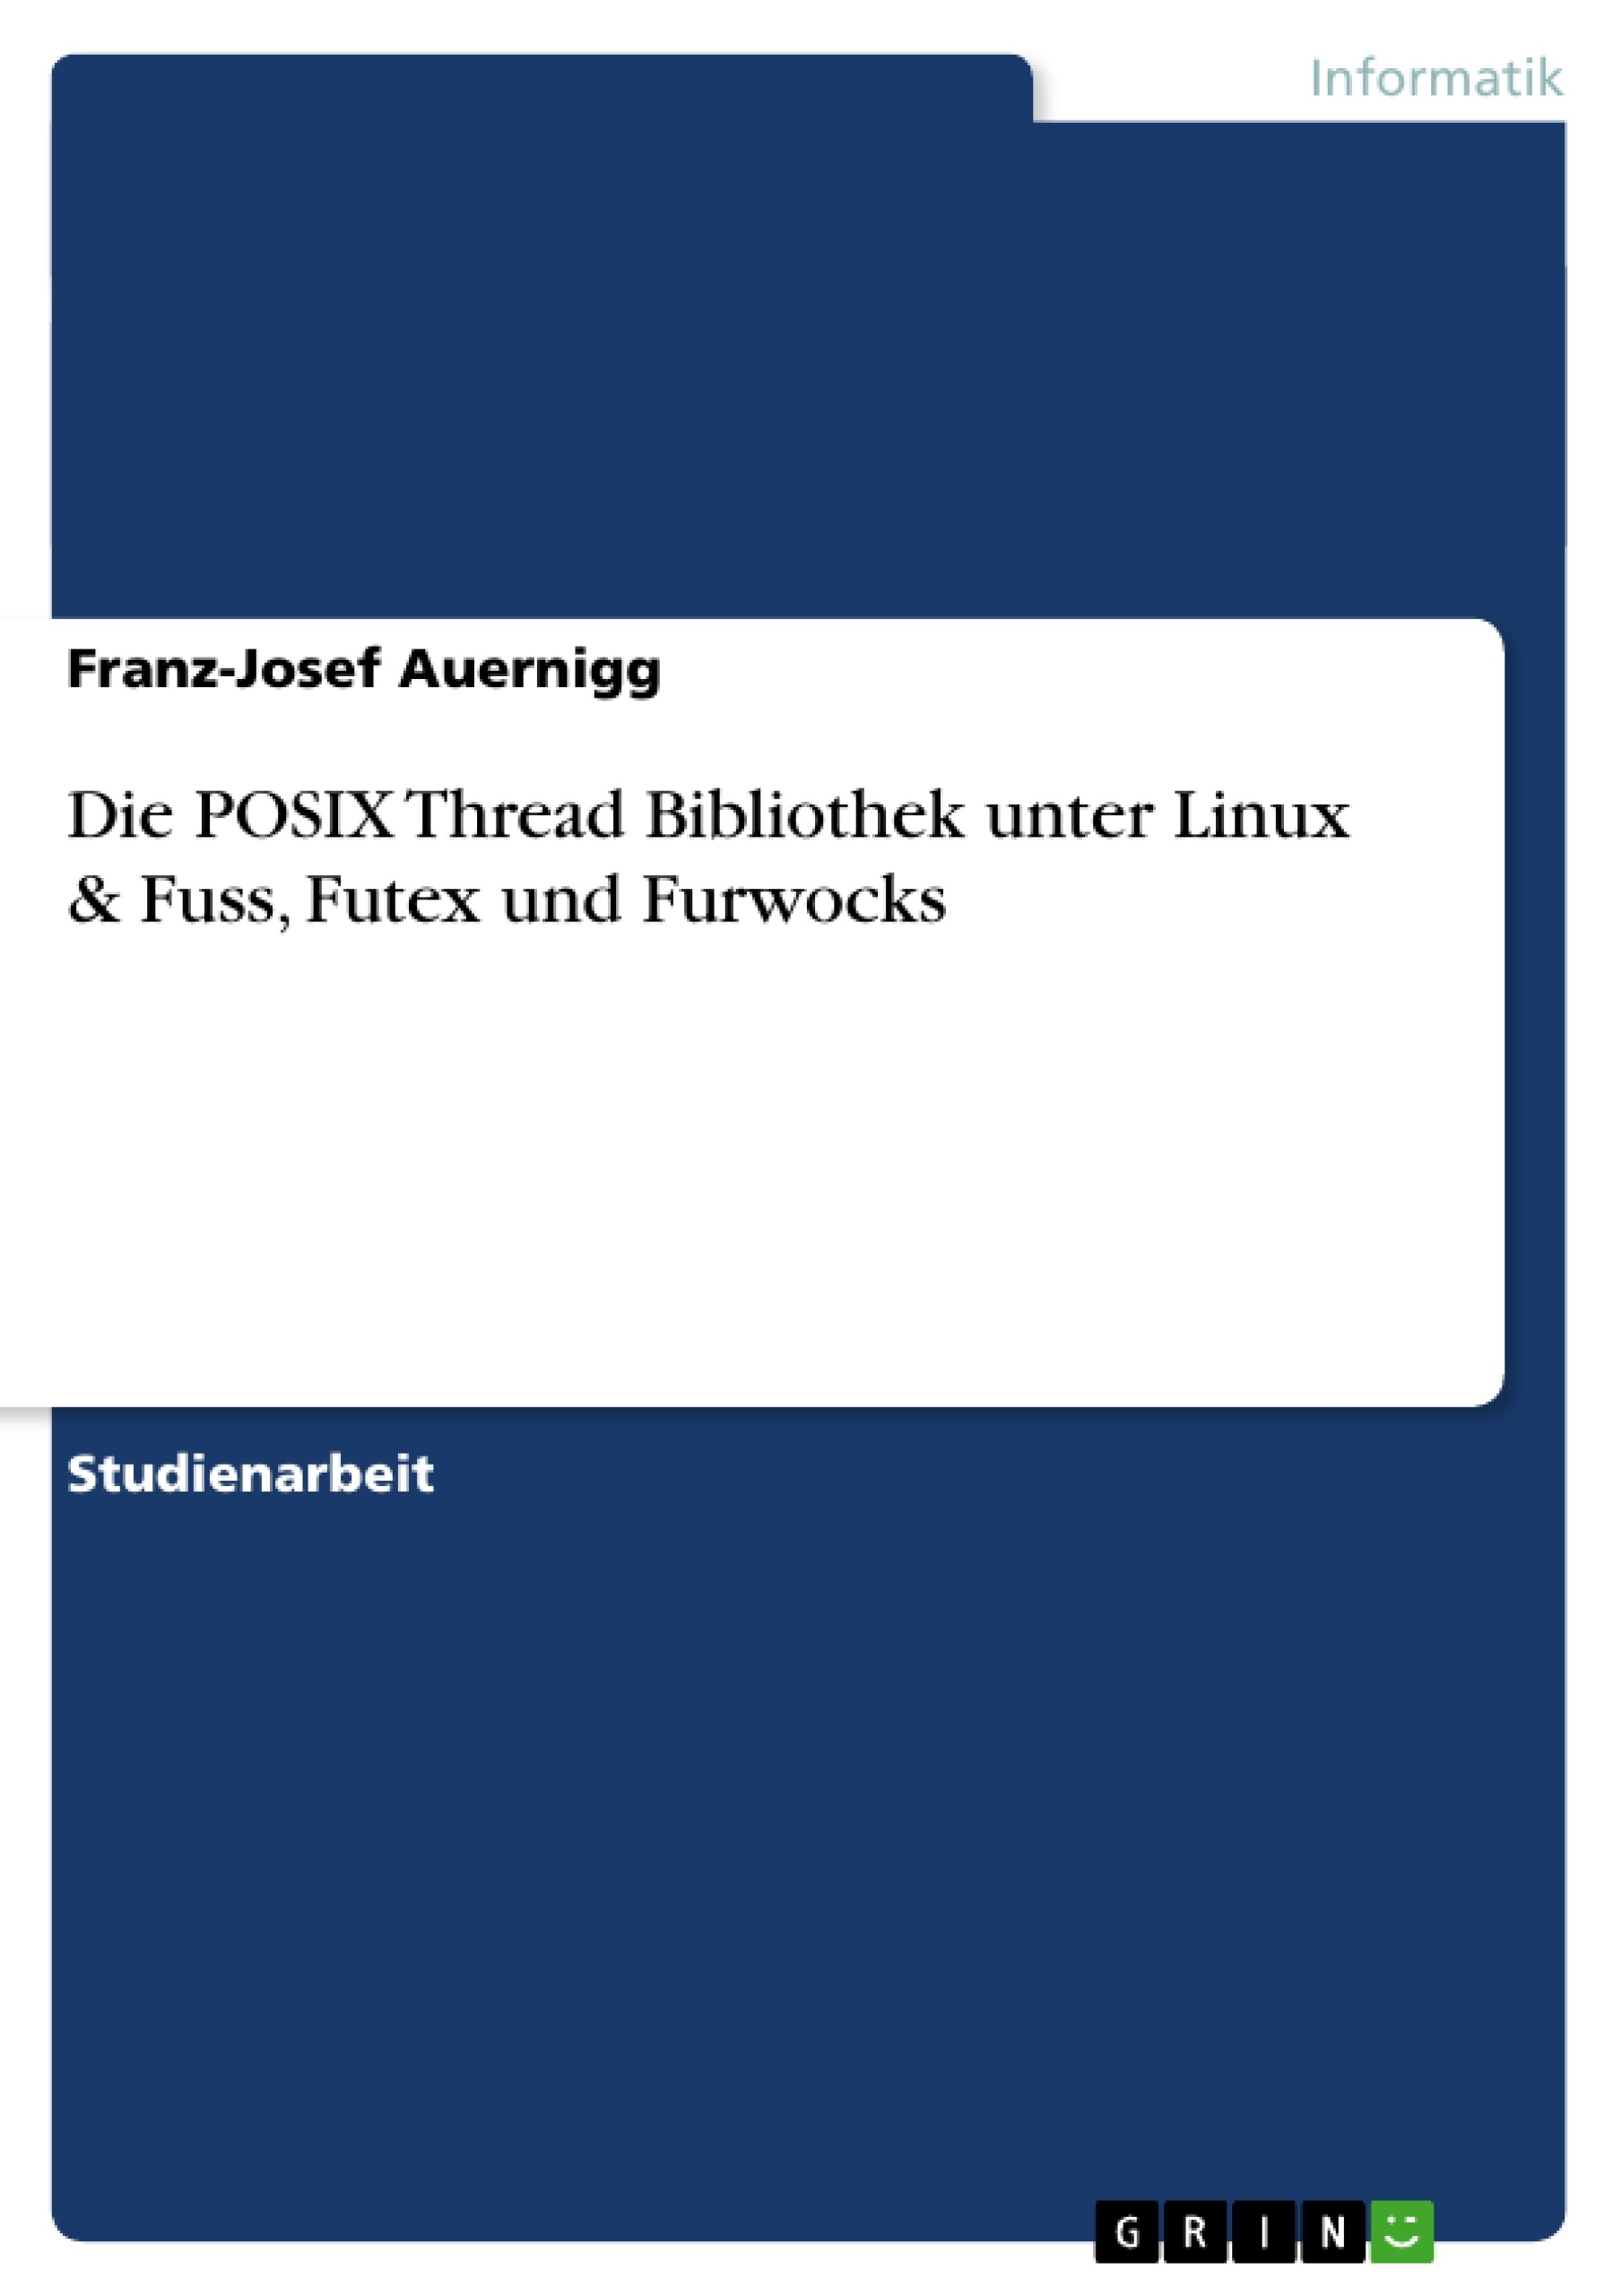 Titel: Die POSIX Thread Bibliothek unter Linux & Fuss, Futex und Furwocks